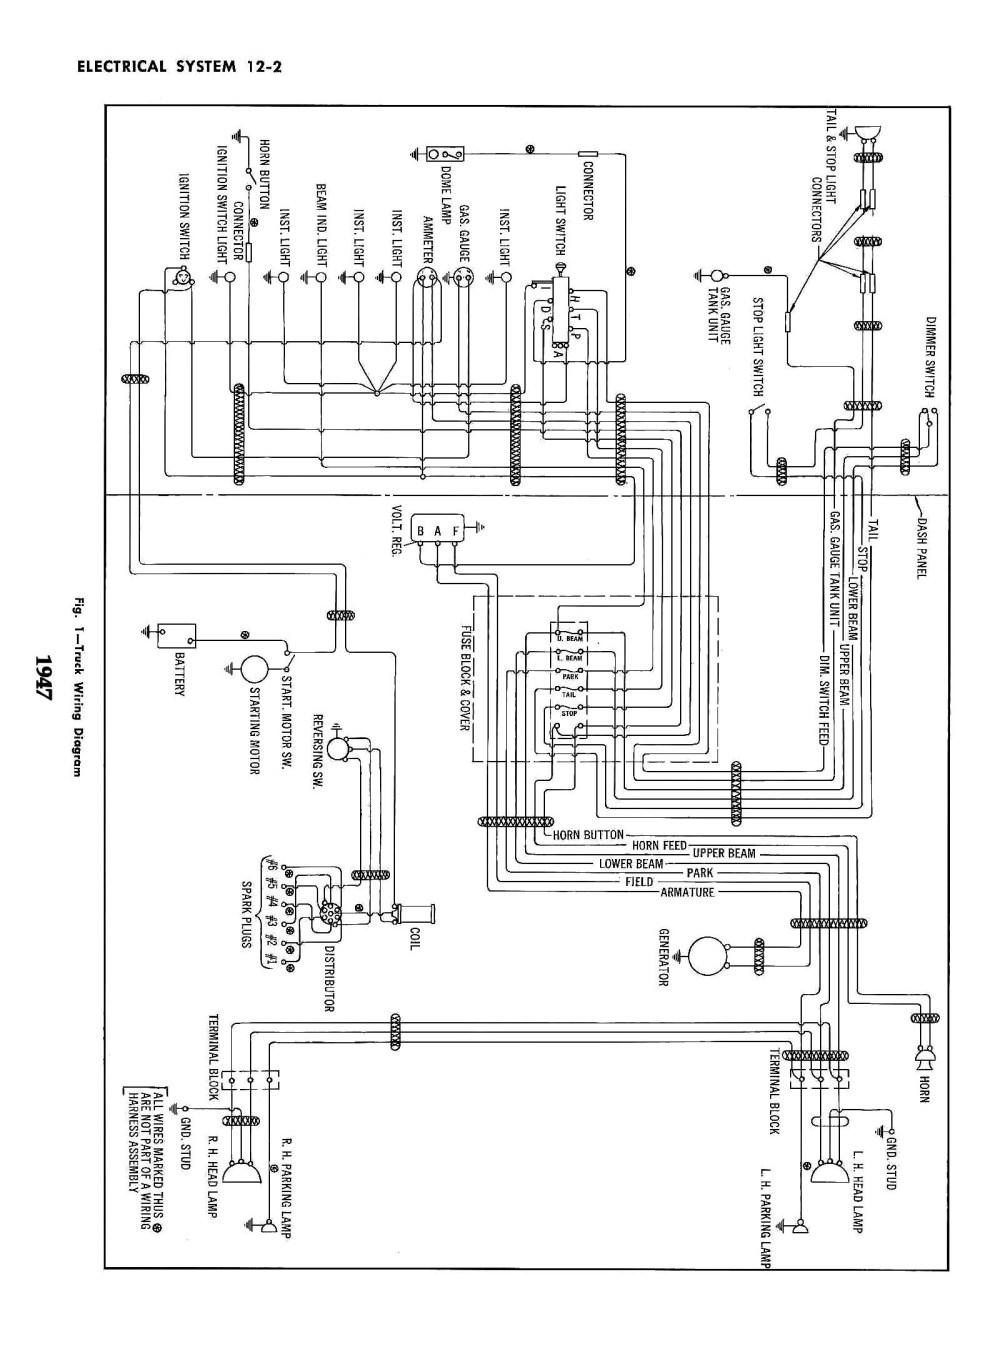 medium resolution of 1953 chevy truck wiring diagram chevy wiring diagrams